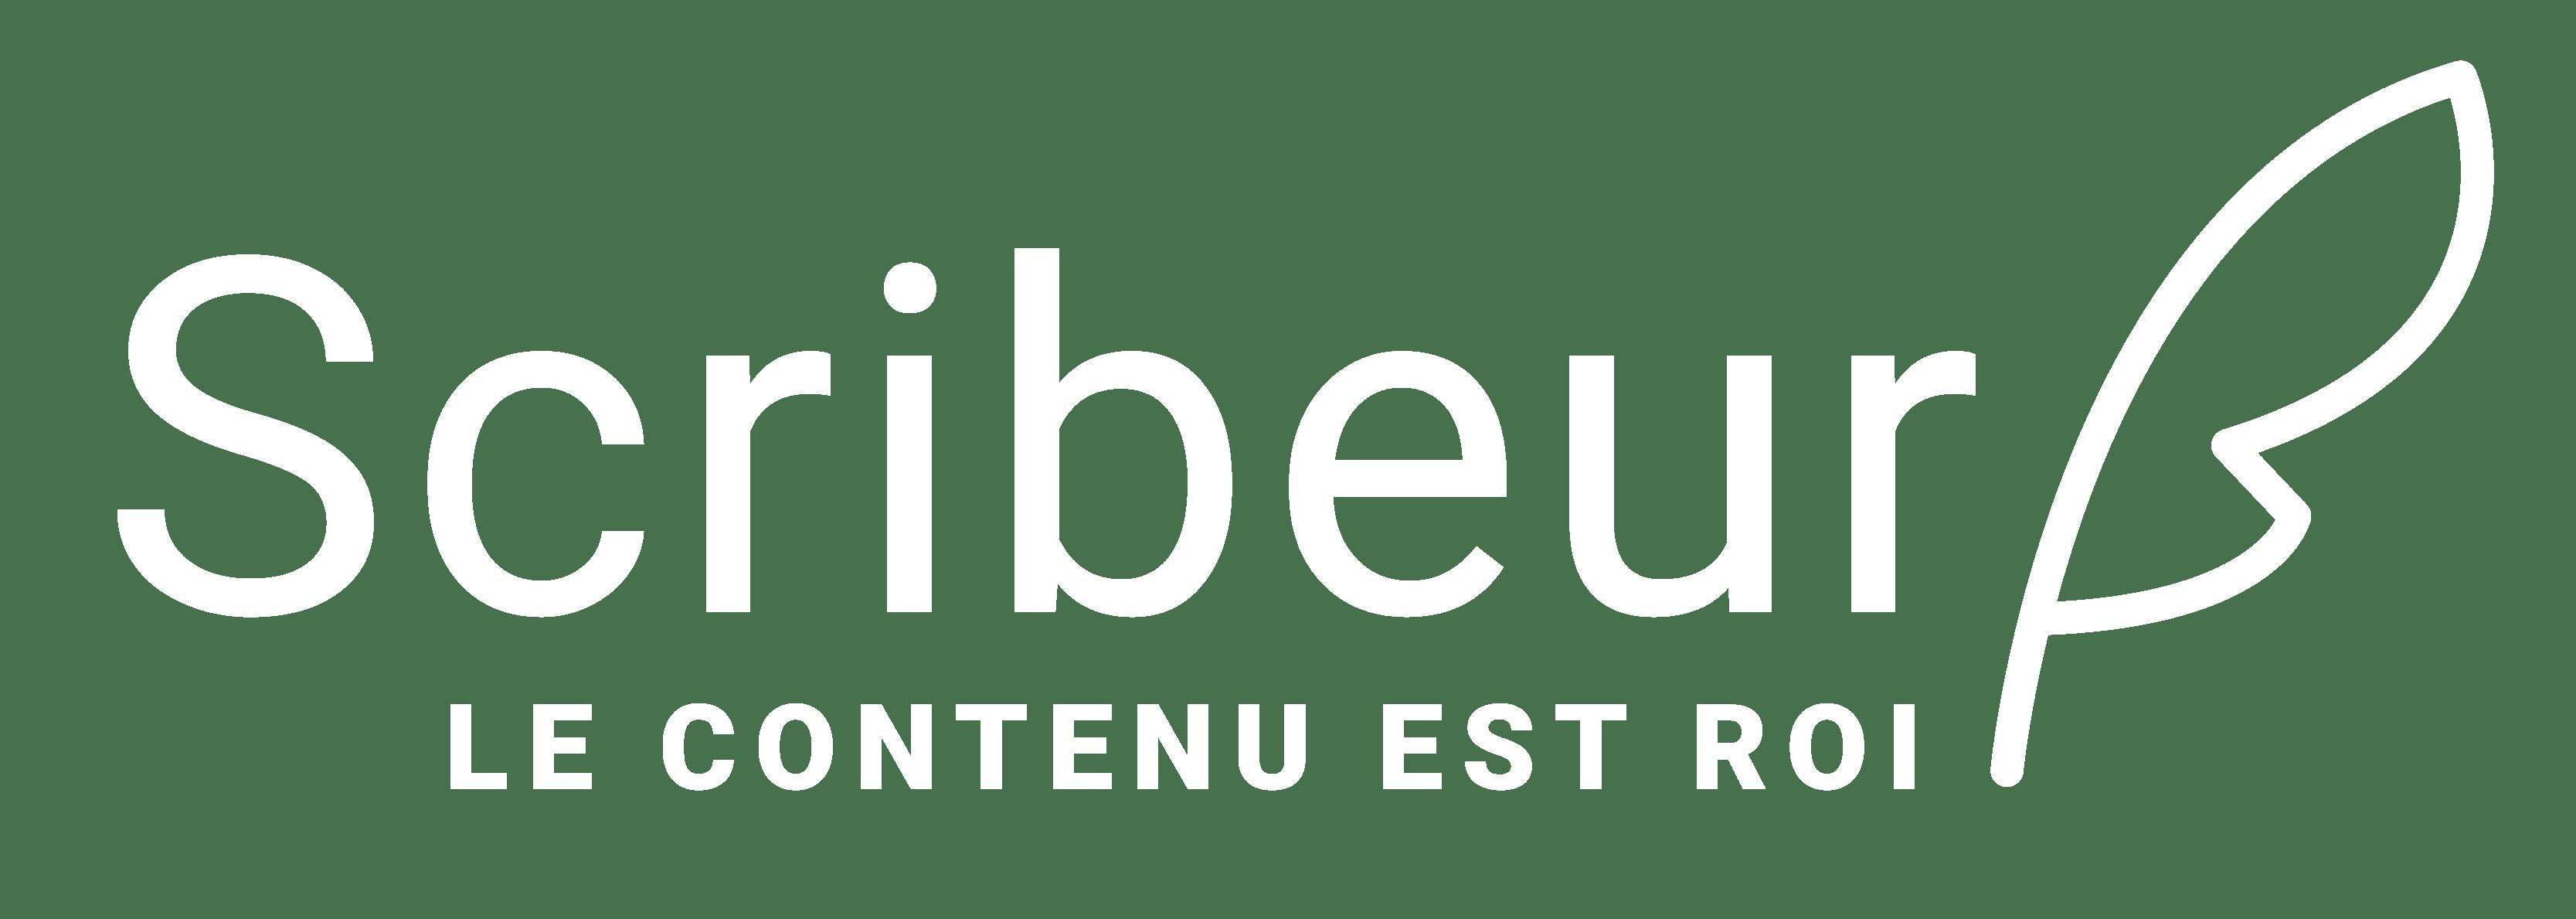 logo scribeur_blanc